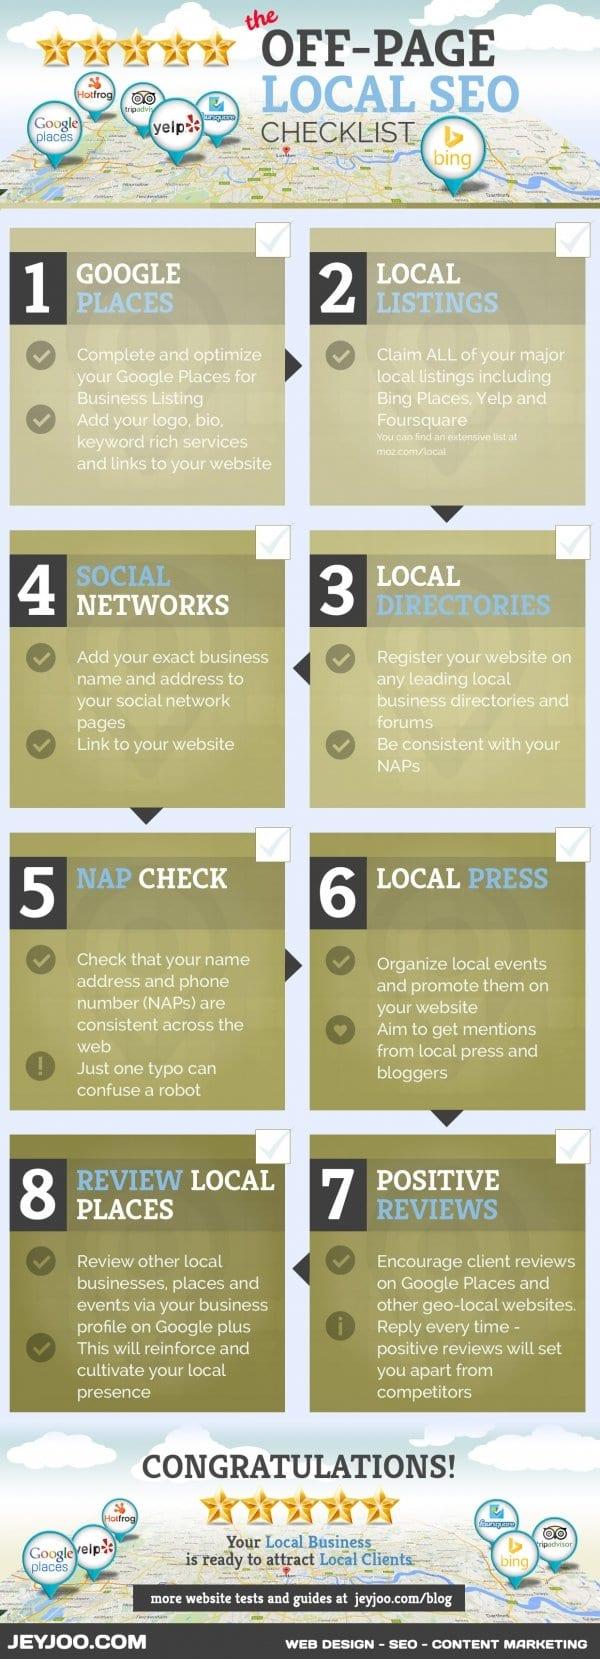 local SEO & Local business